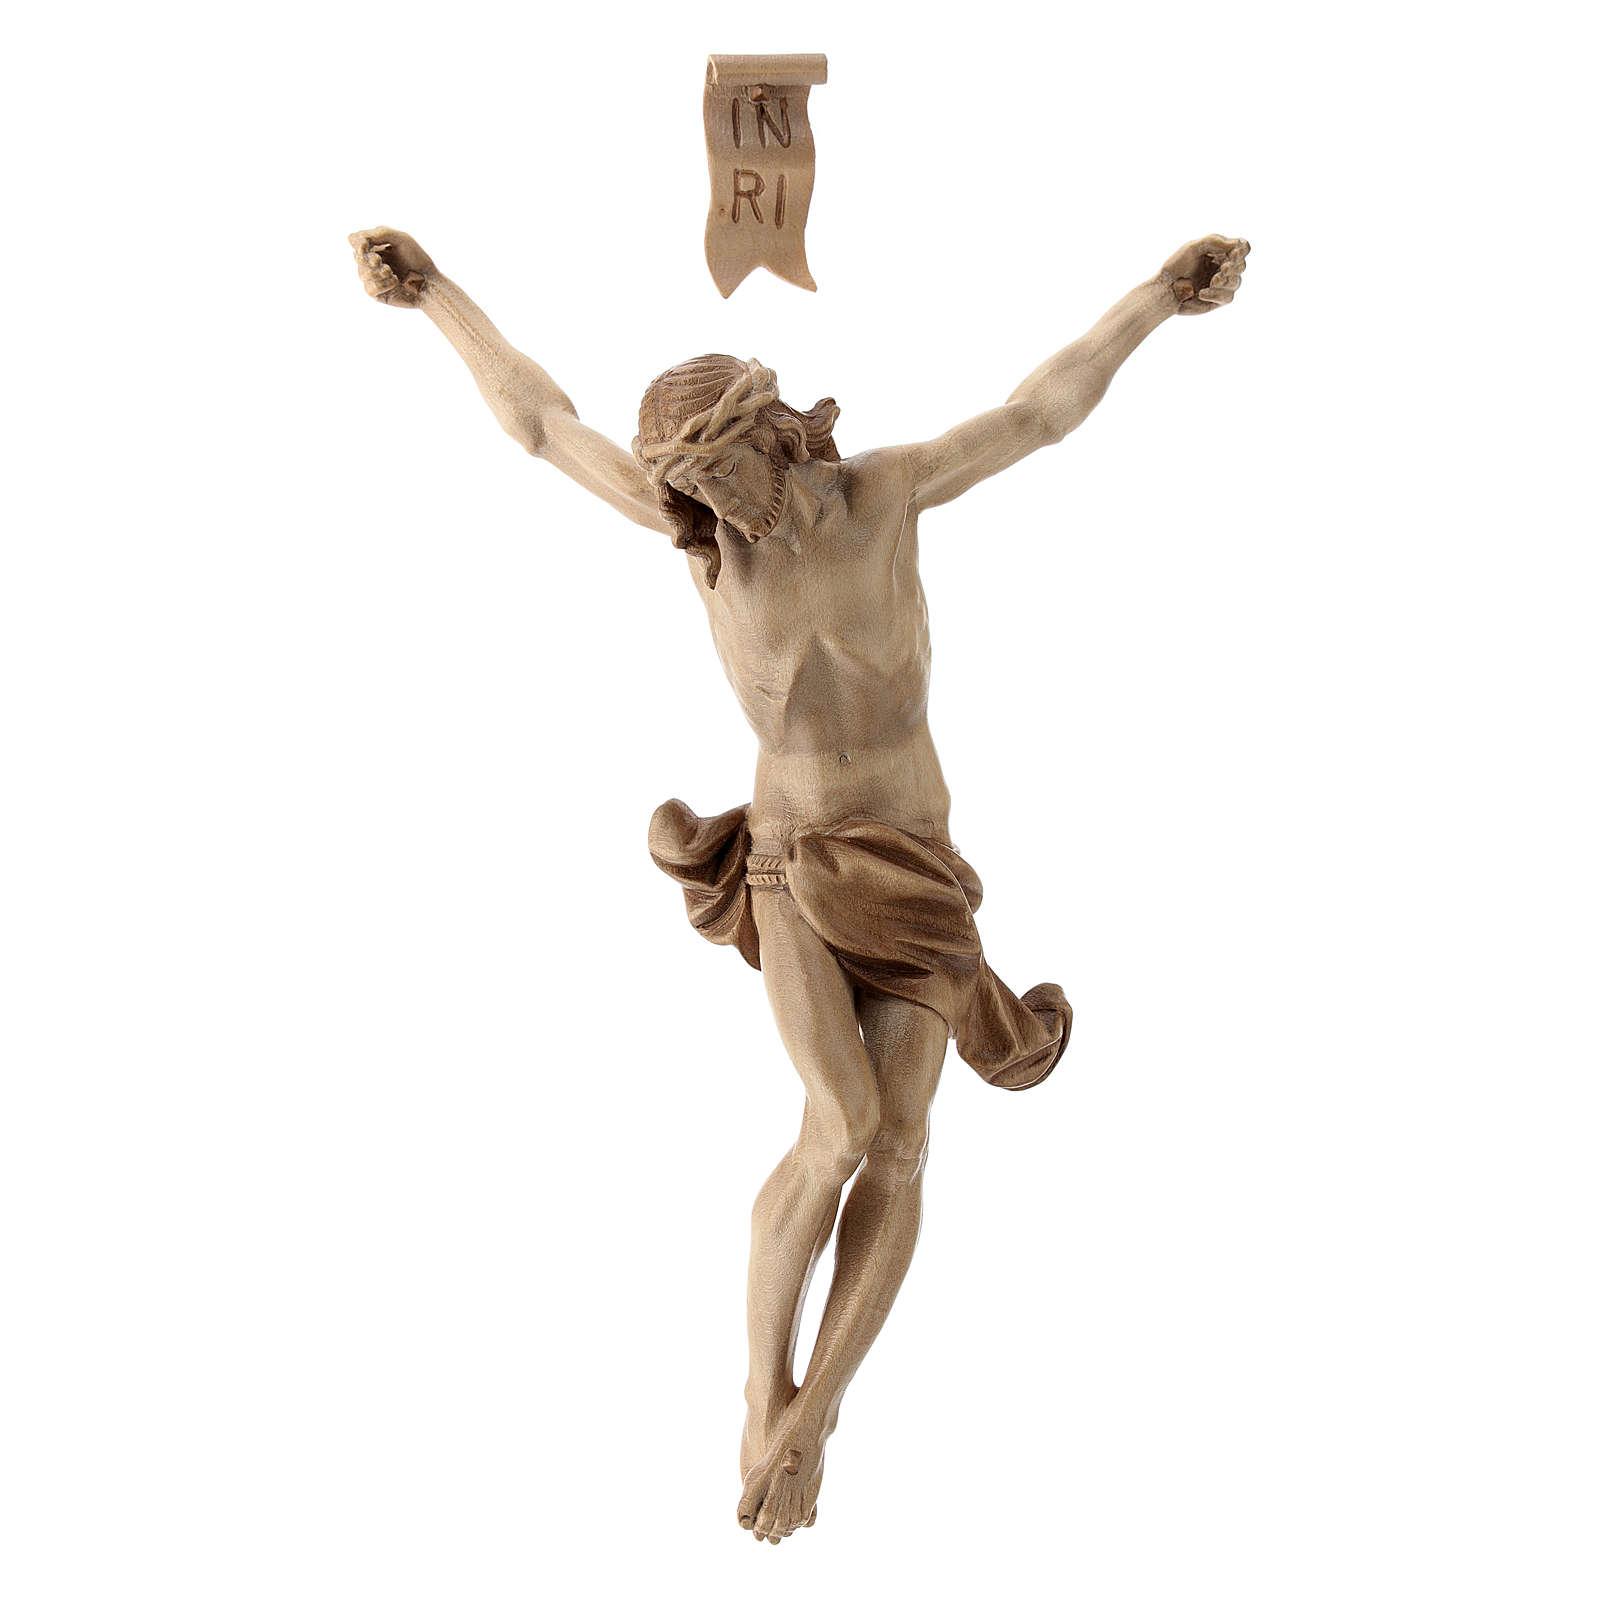 Ciało Chrystusa mod. Corpus drewno Valgardena patynowane 4